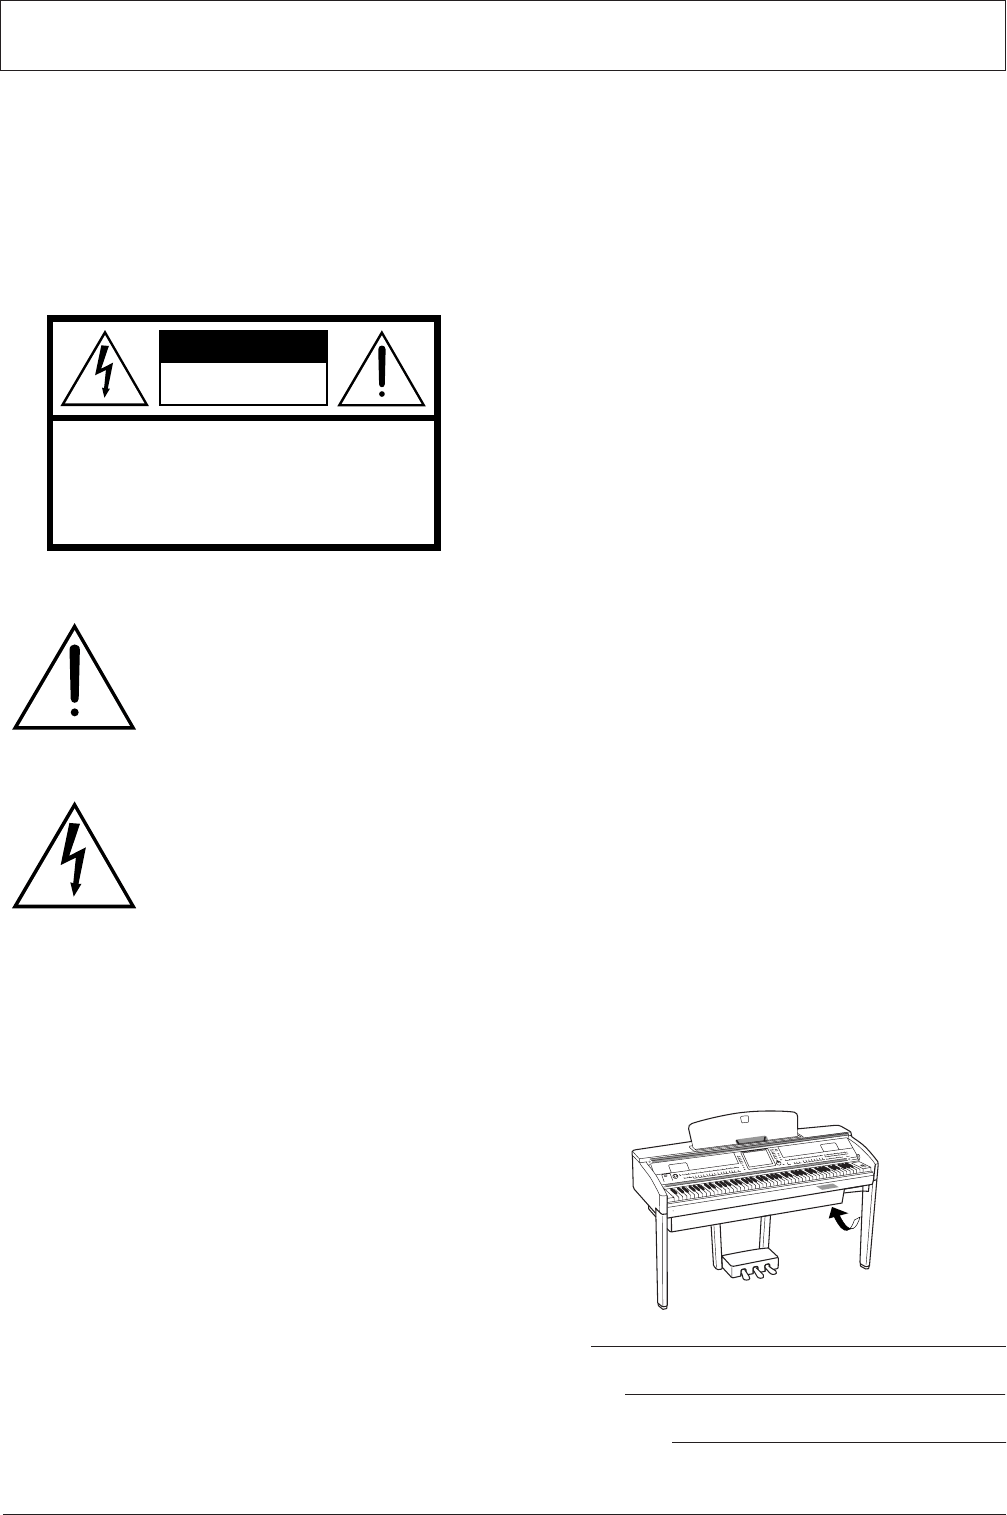 Yamaha CVP-505, CVP-501, CVP-503 SPECIAL MESSAGE SECTION